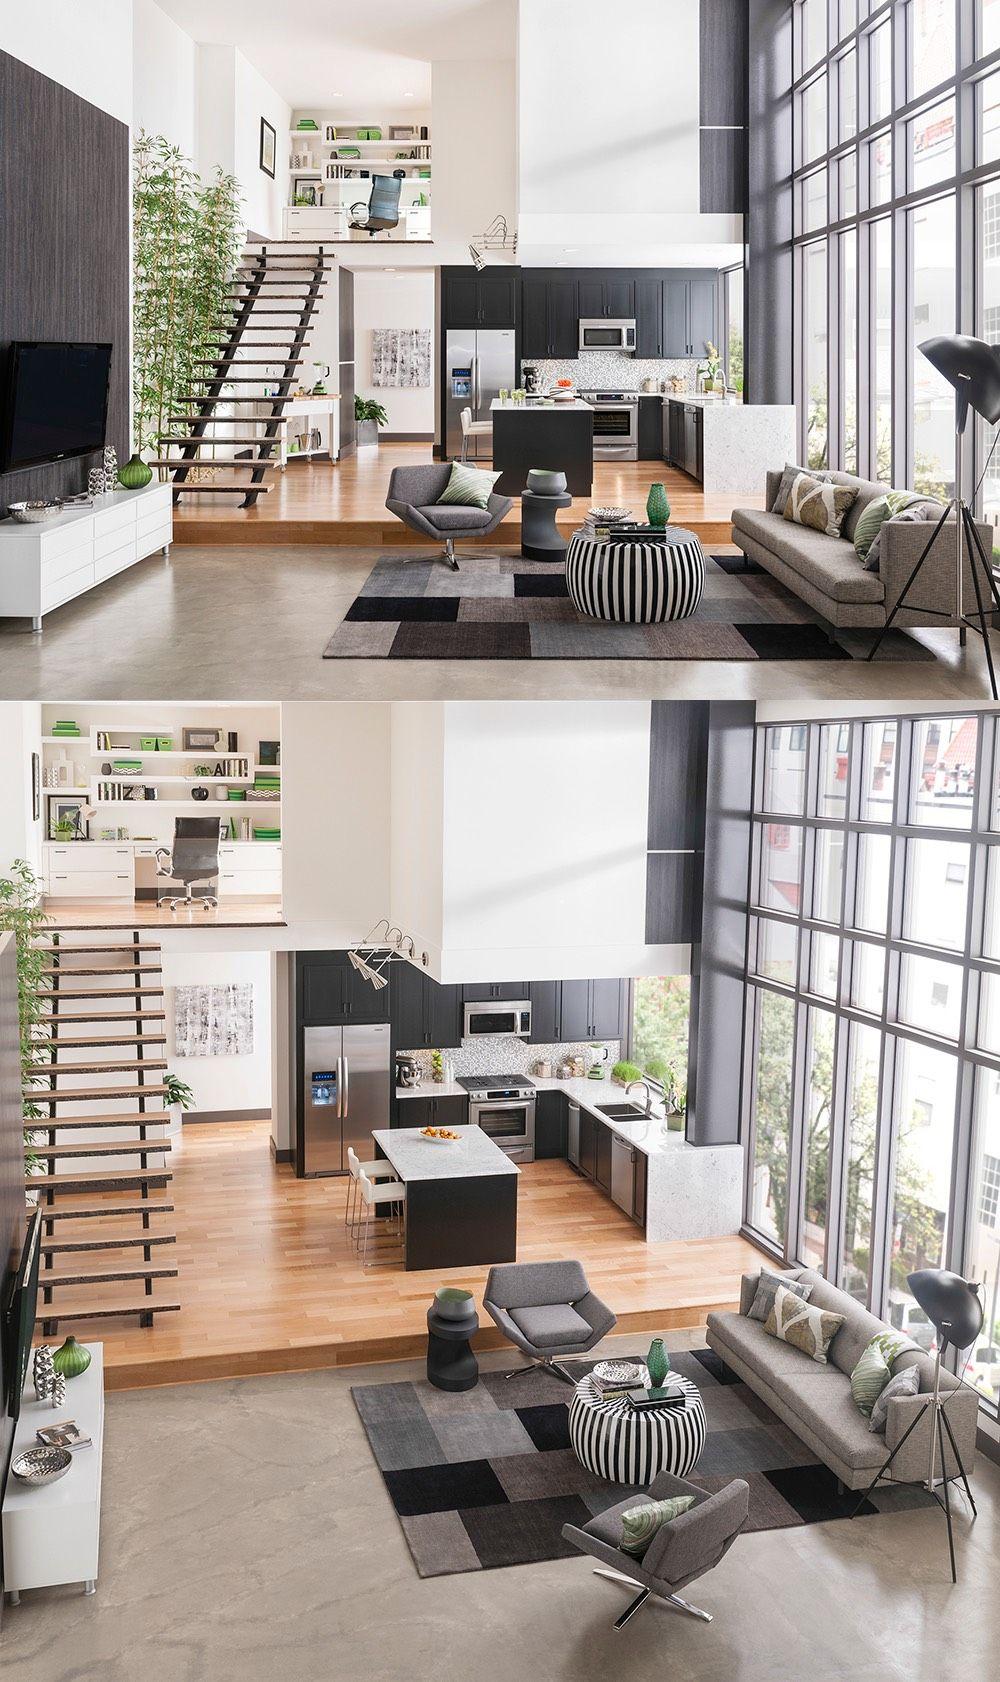 Loft house design duplex modern interior also minimal inspiration home pinterest apartment rh